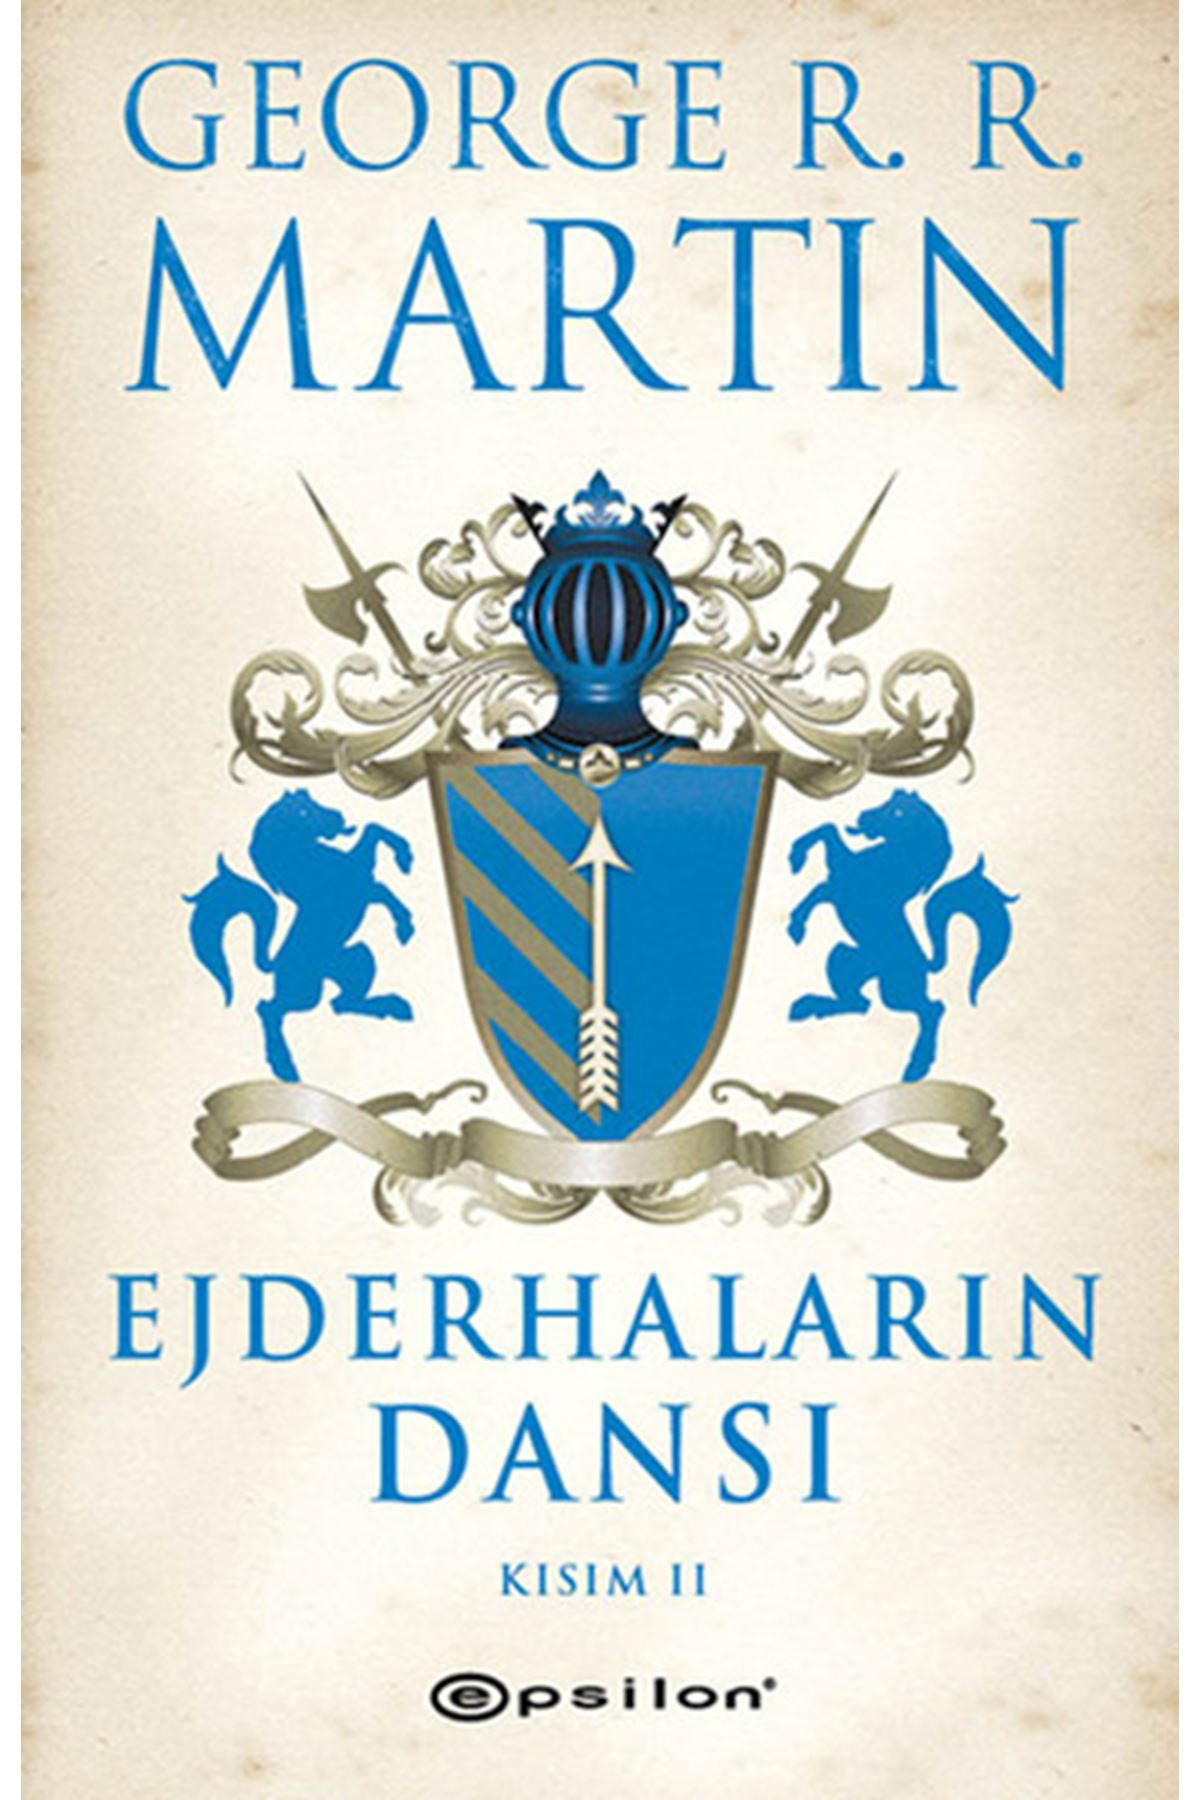 GEORGE R. R. MARTIN - EJDERHALARIN DANSI KISIM 2